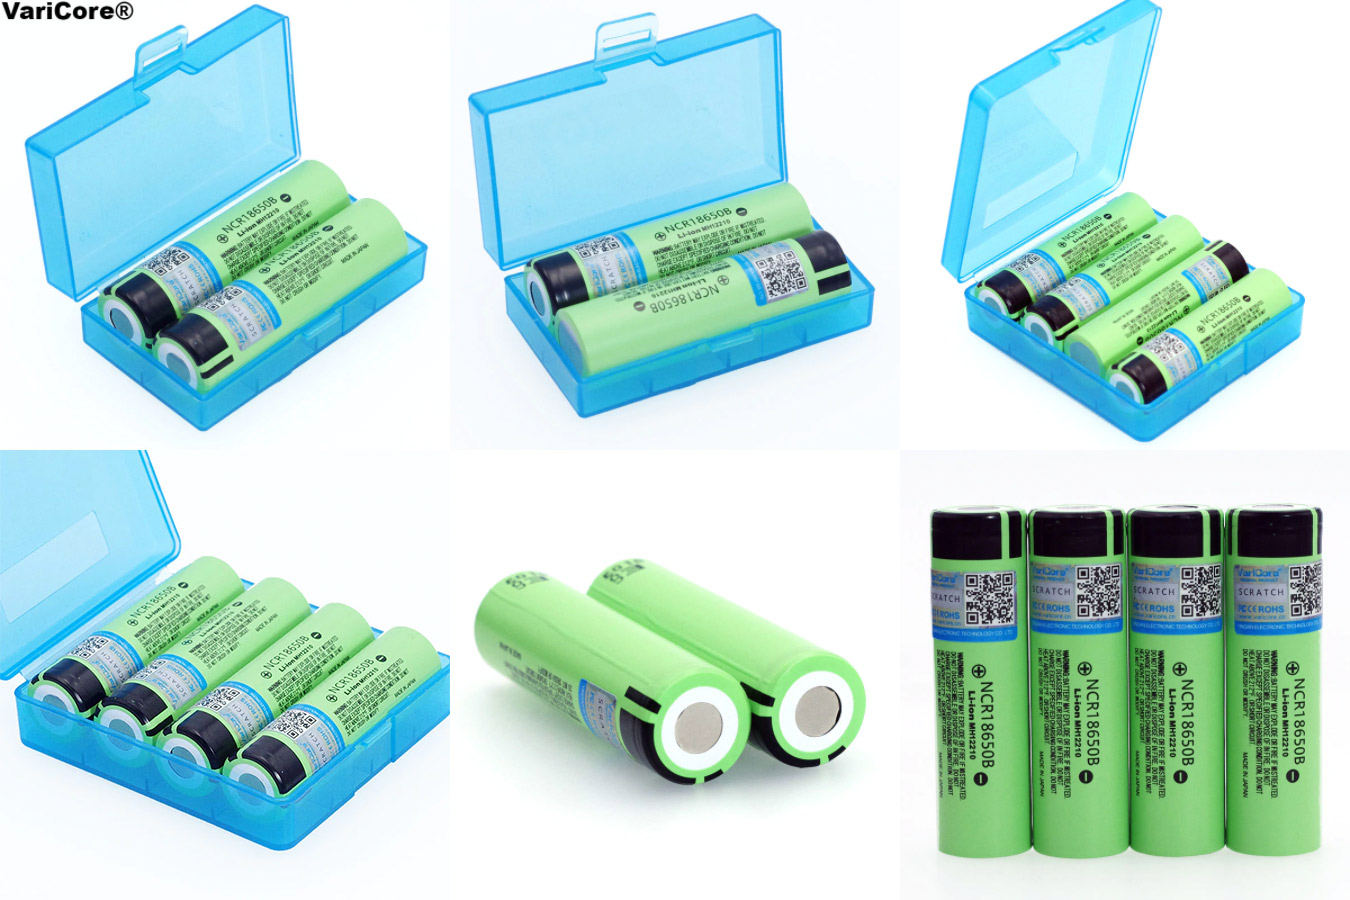 Батареи с коробочкой для хранения